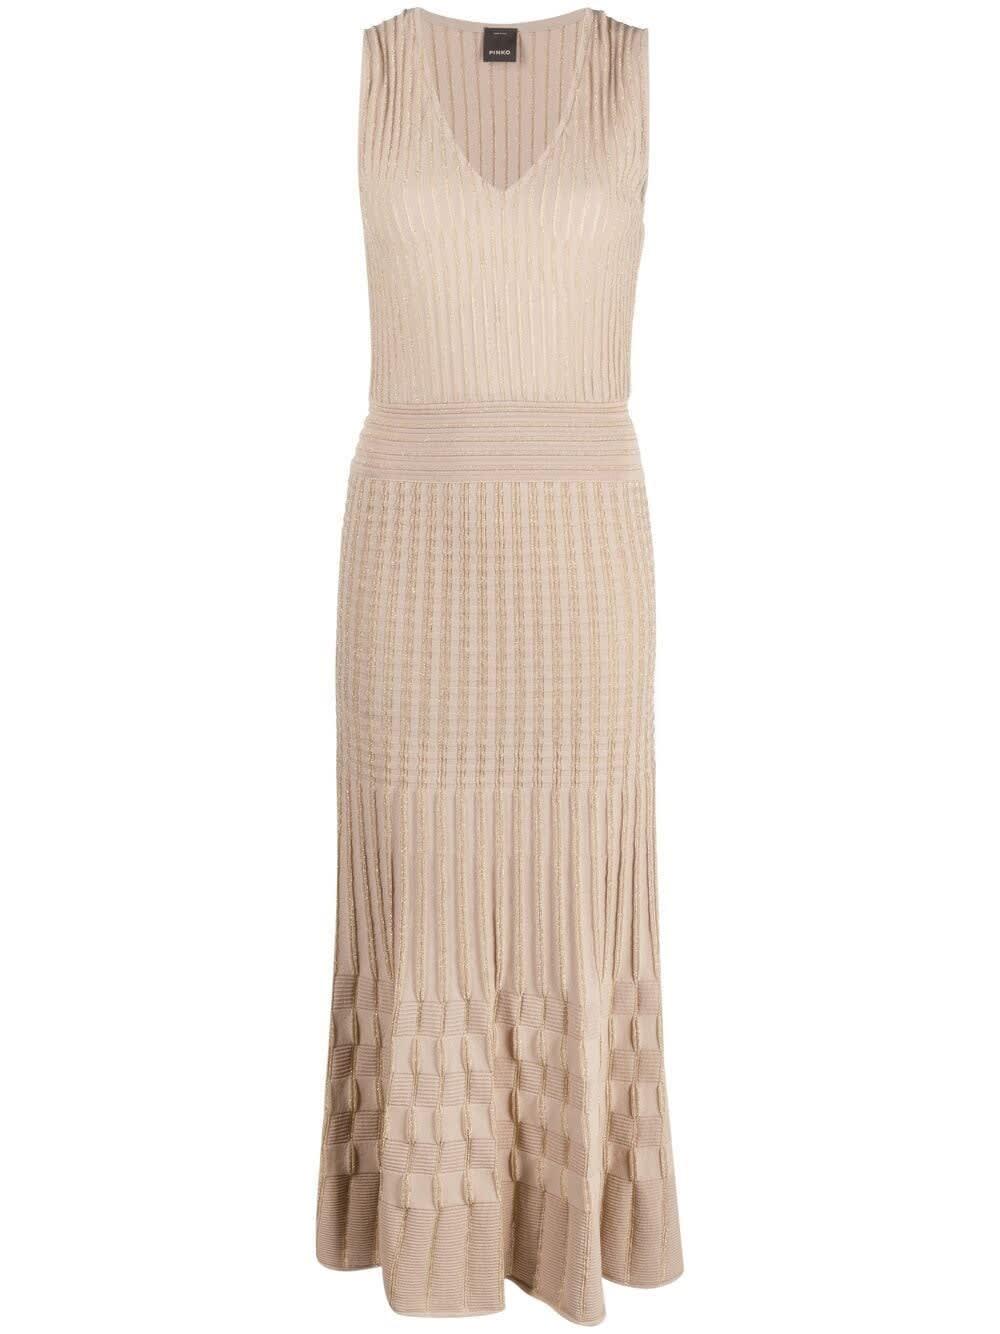 Pinko LONG BEIGE COTTON LUREX DRESS